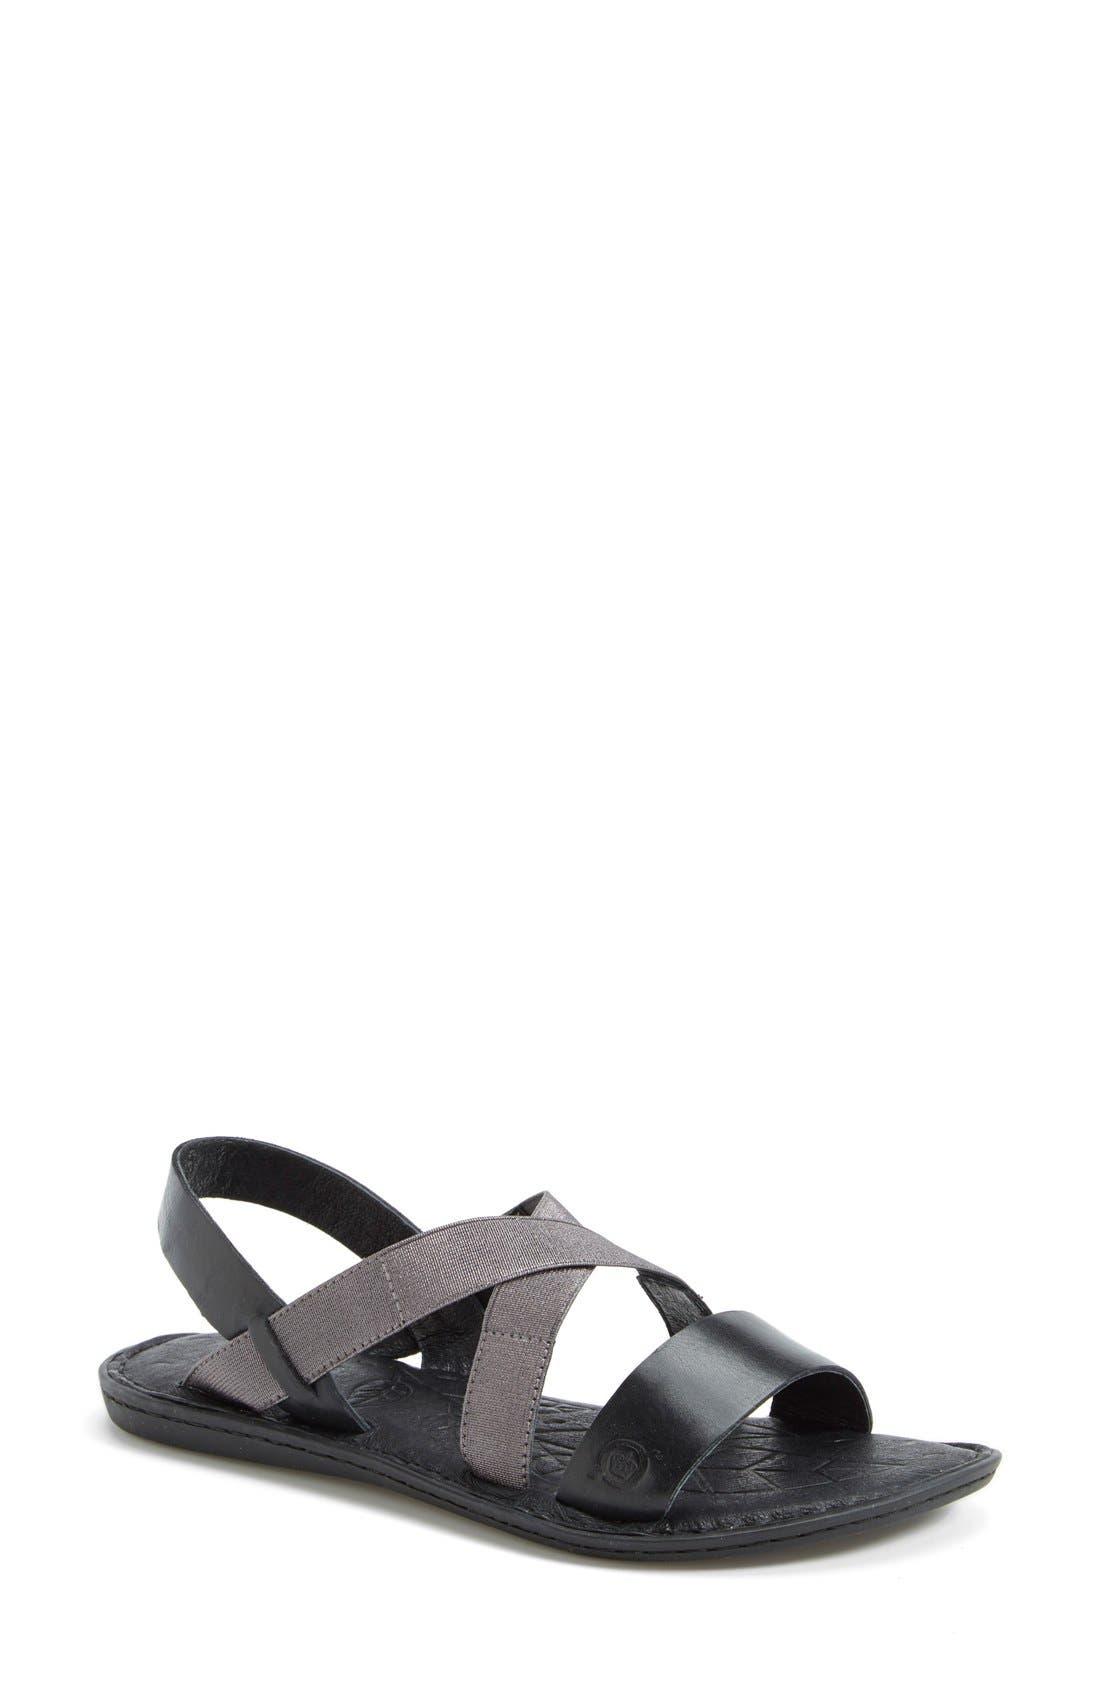 'Icelyn' Flat Sandal, Main, color, 001